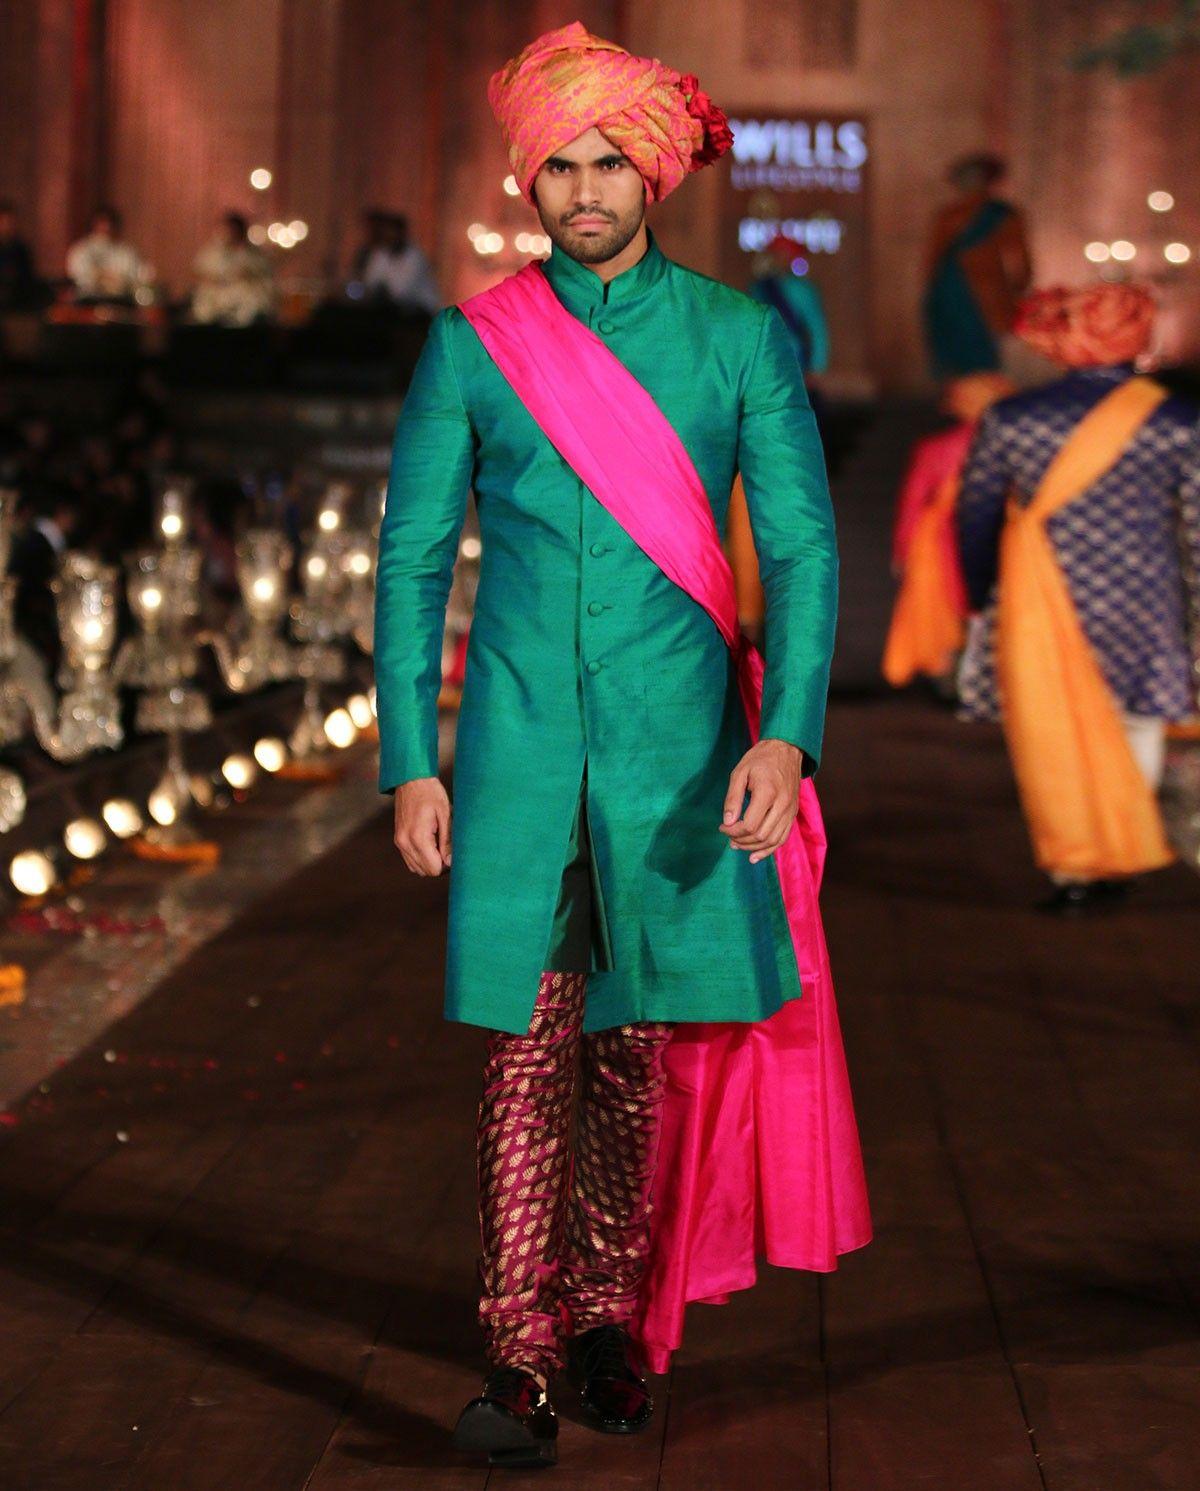 Cute Wedding Reception Dress For Indian Groom Images - Wedding Ideas ...